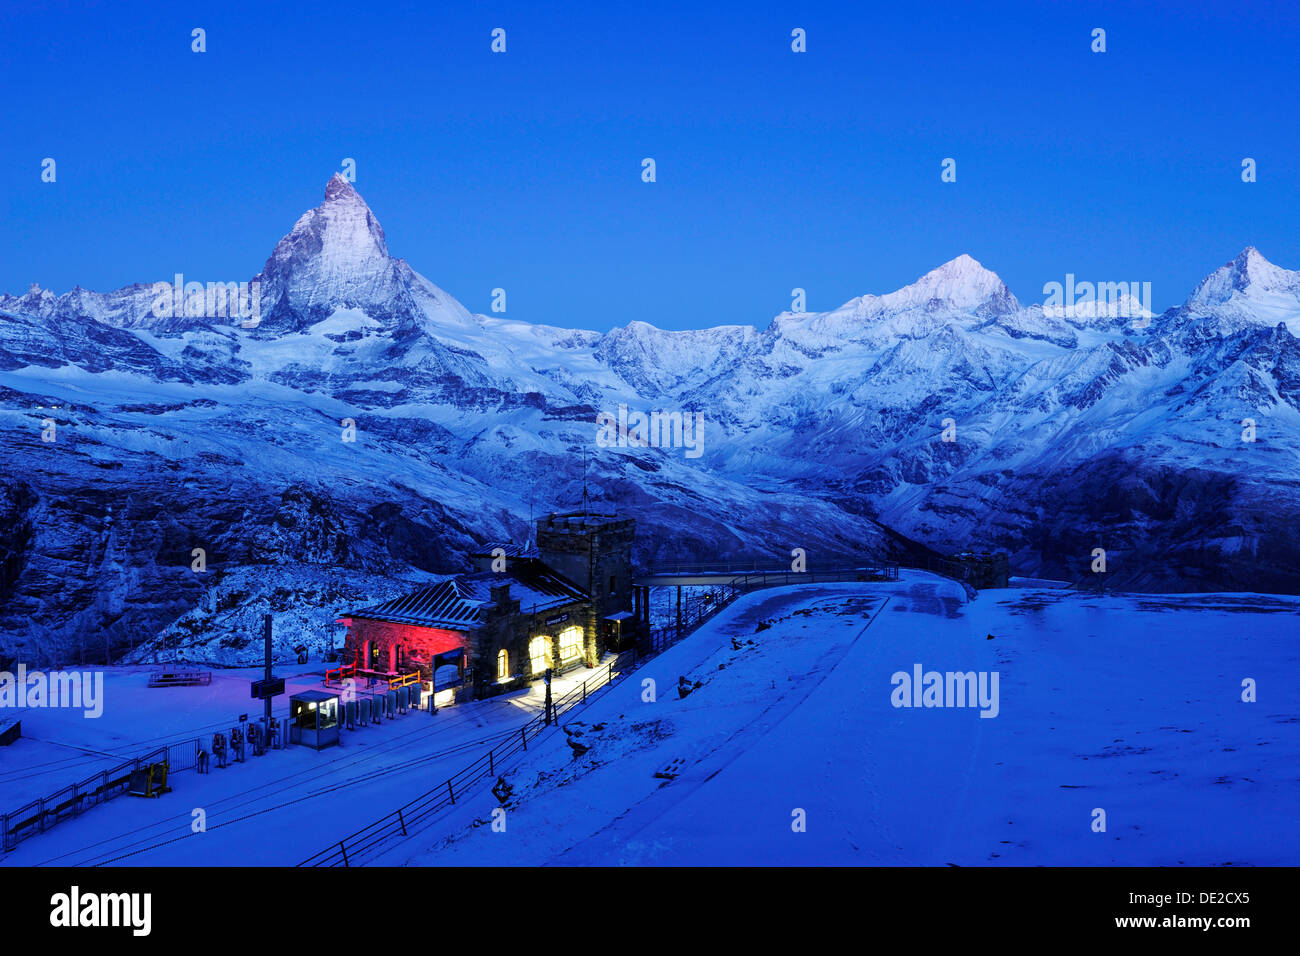 Gornergrad estación de montaña con el Matterhorn, Zermatt, Valais, Suiza, Europa Foto de stock